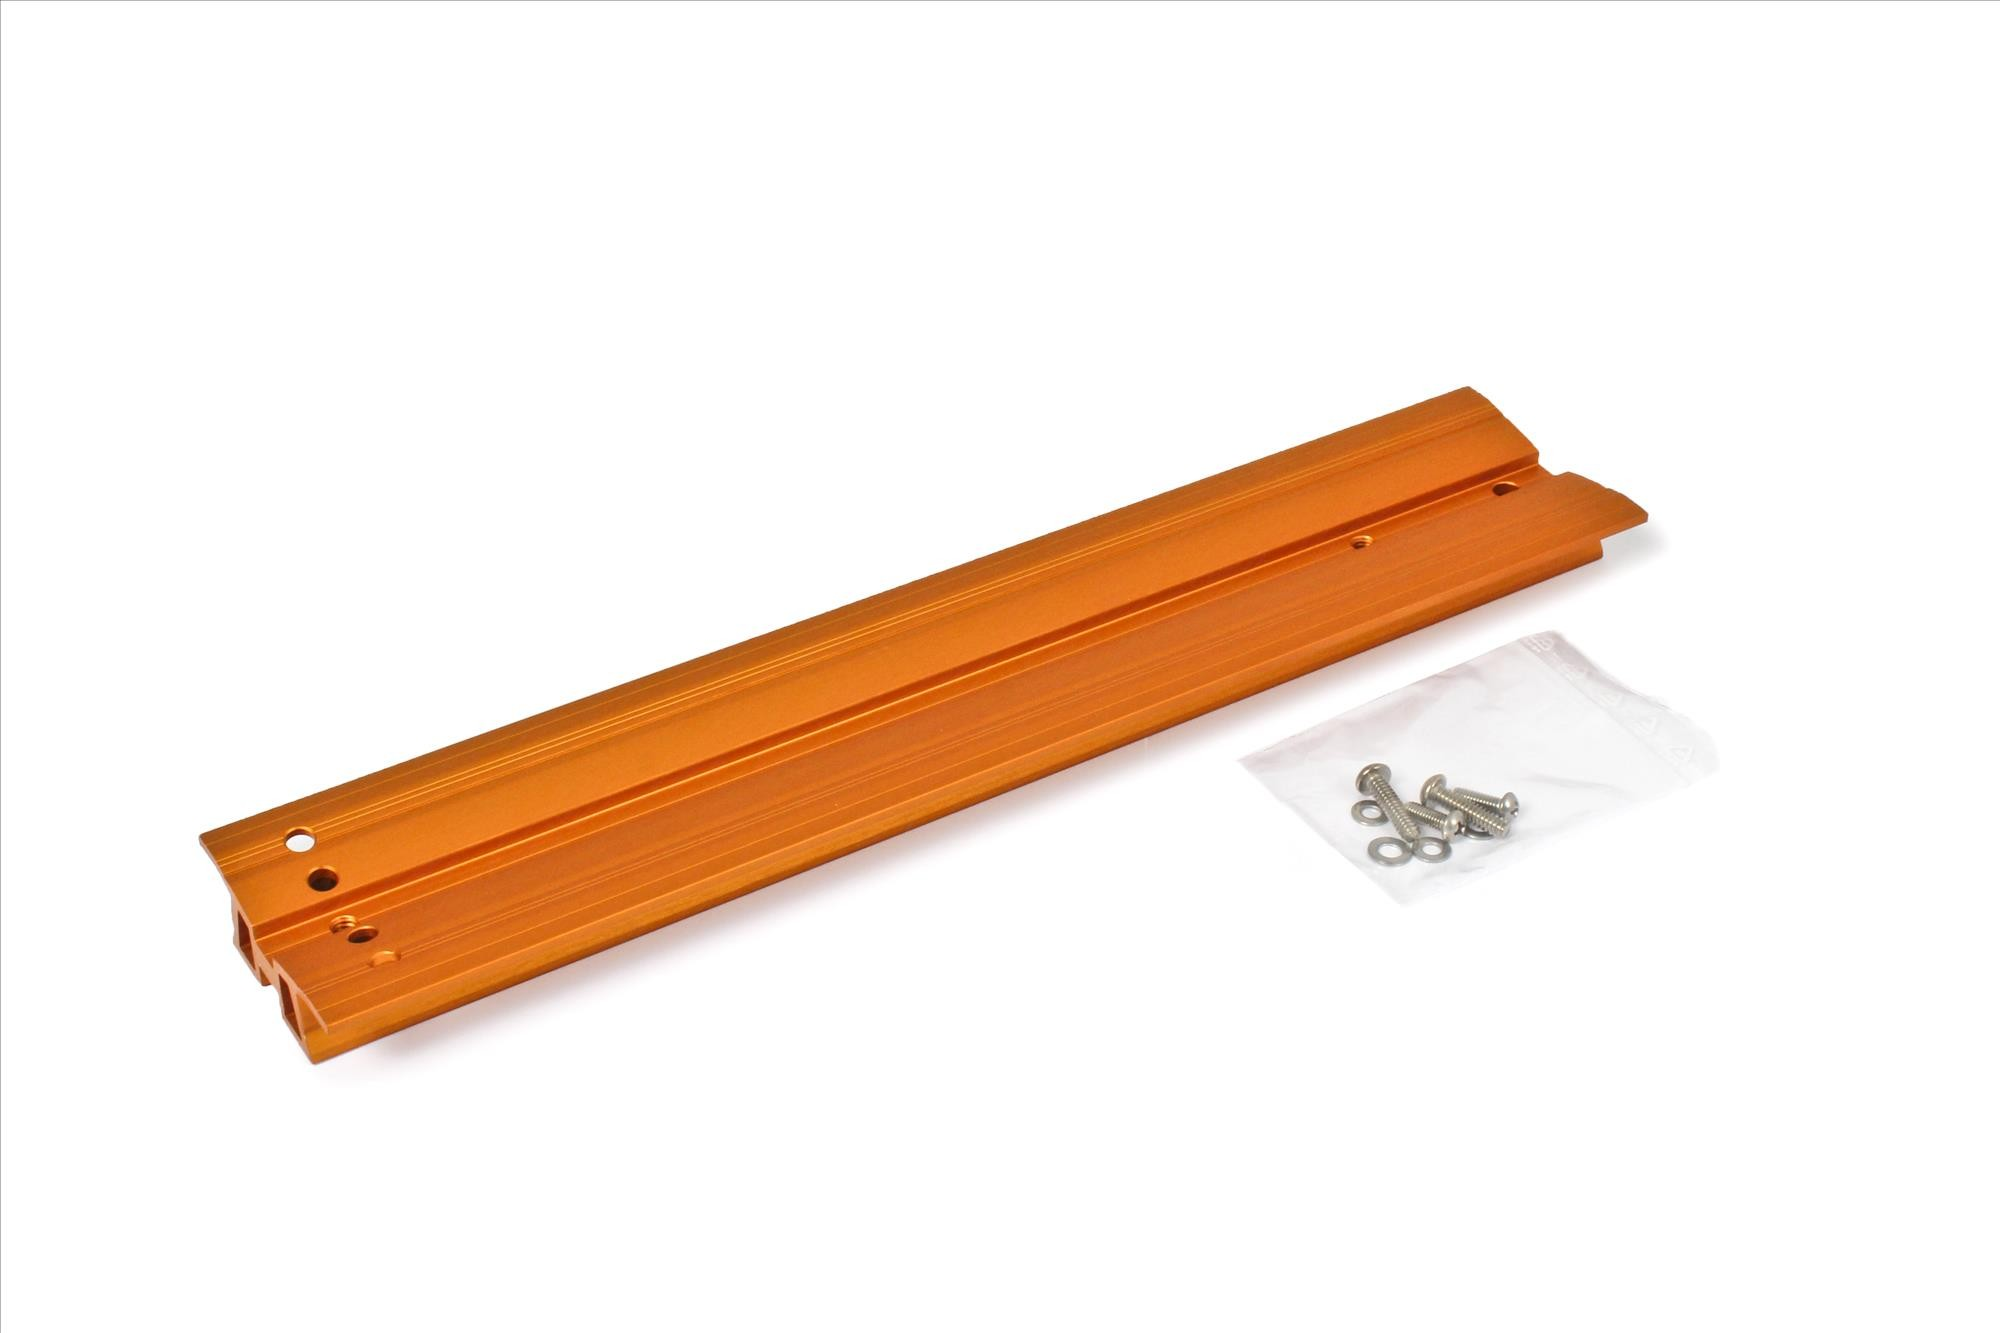 "V-Dove Tail Celestron-orange anodized, 345mm, drilled for Celestron 8"" SC / HD"